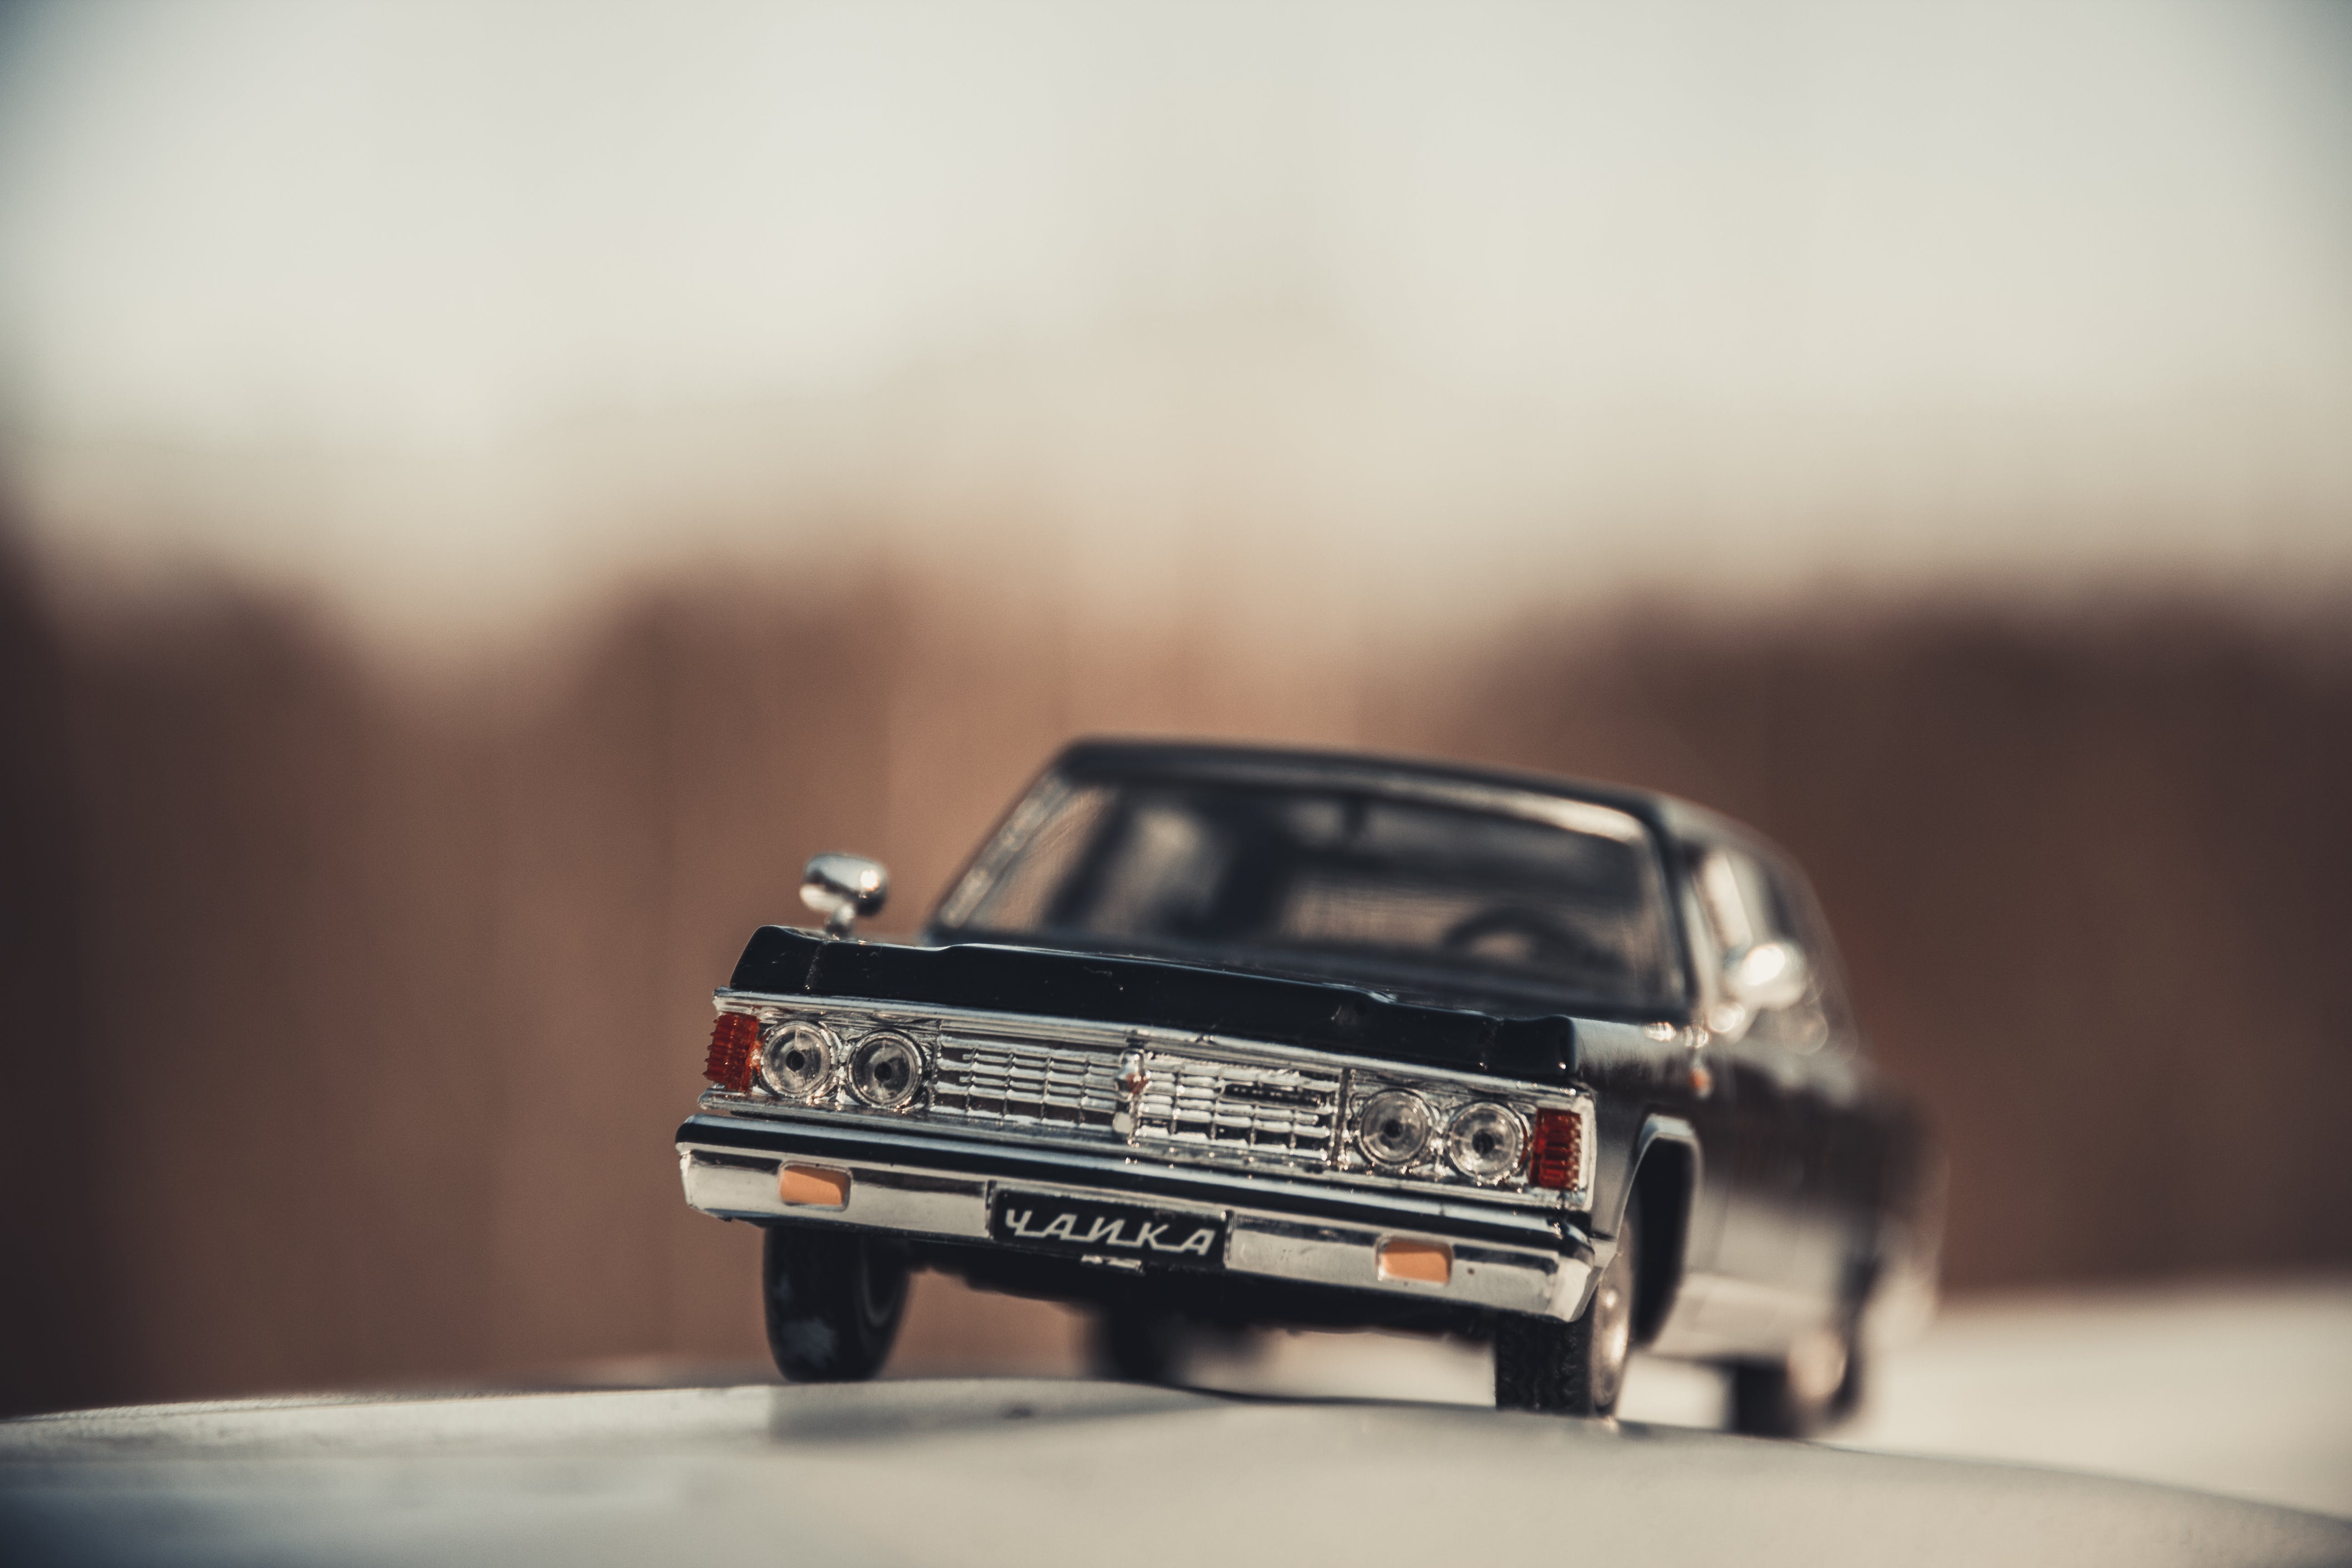 Kostenloses Stock Foto zu auto, automobil, fahrzeug, hintergrund